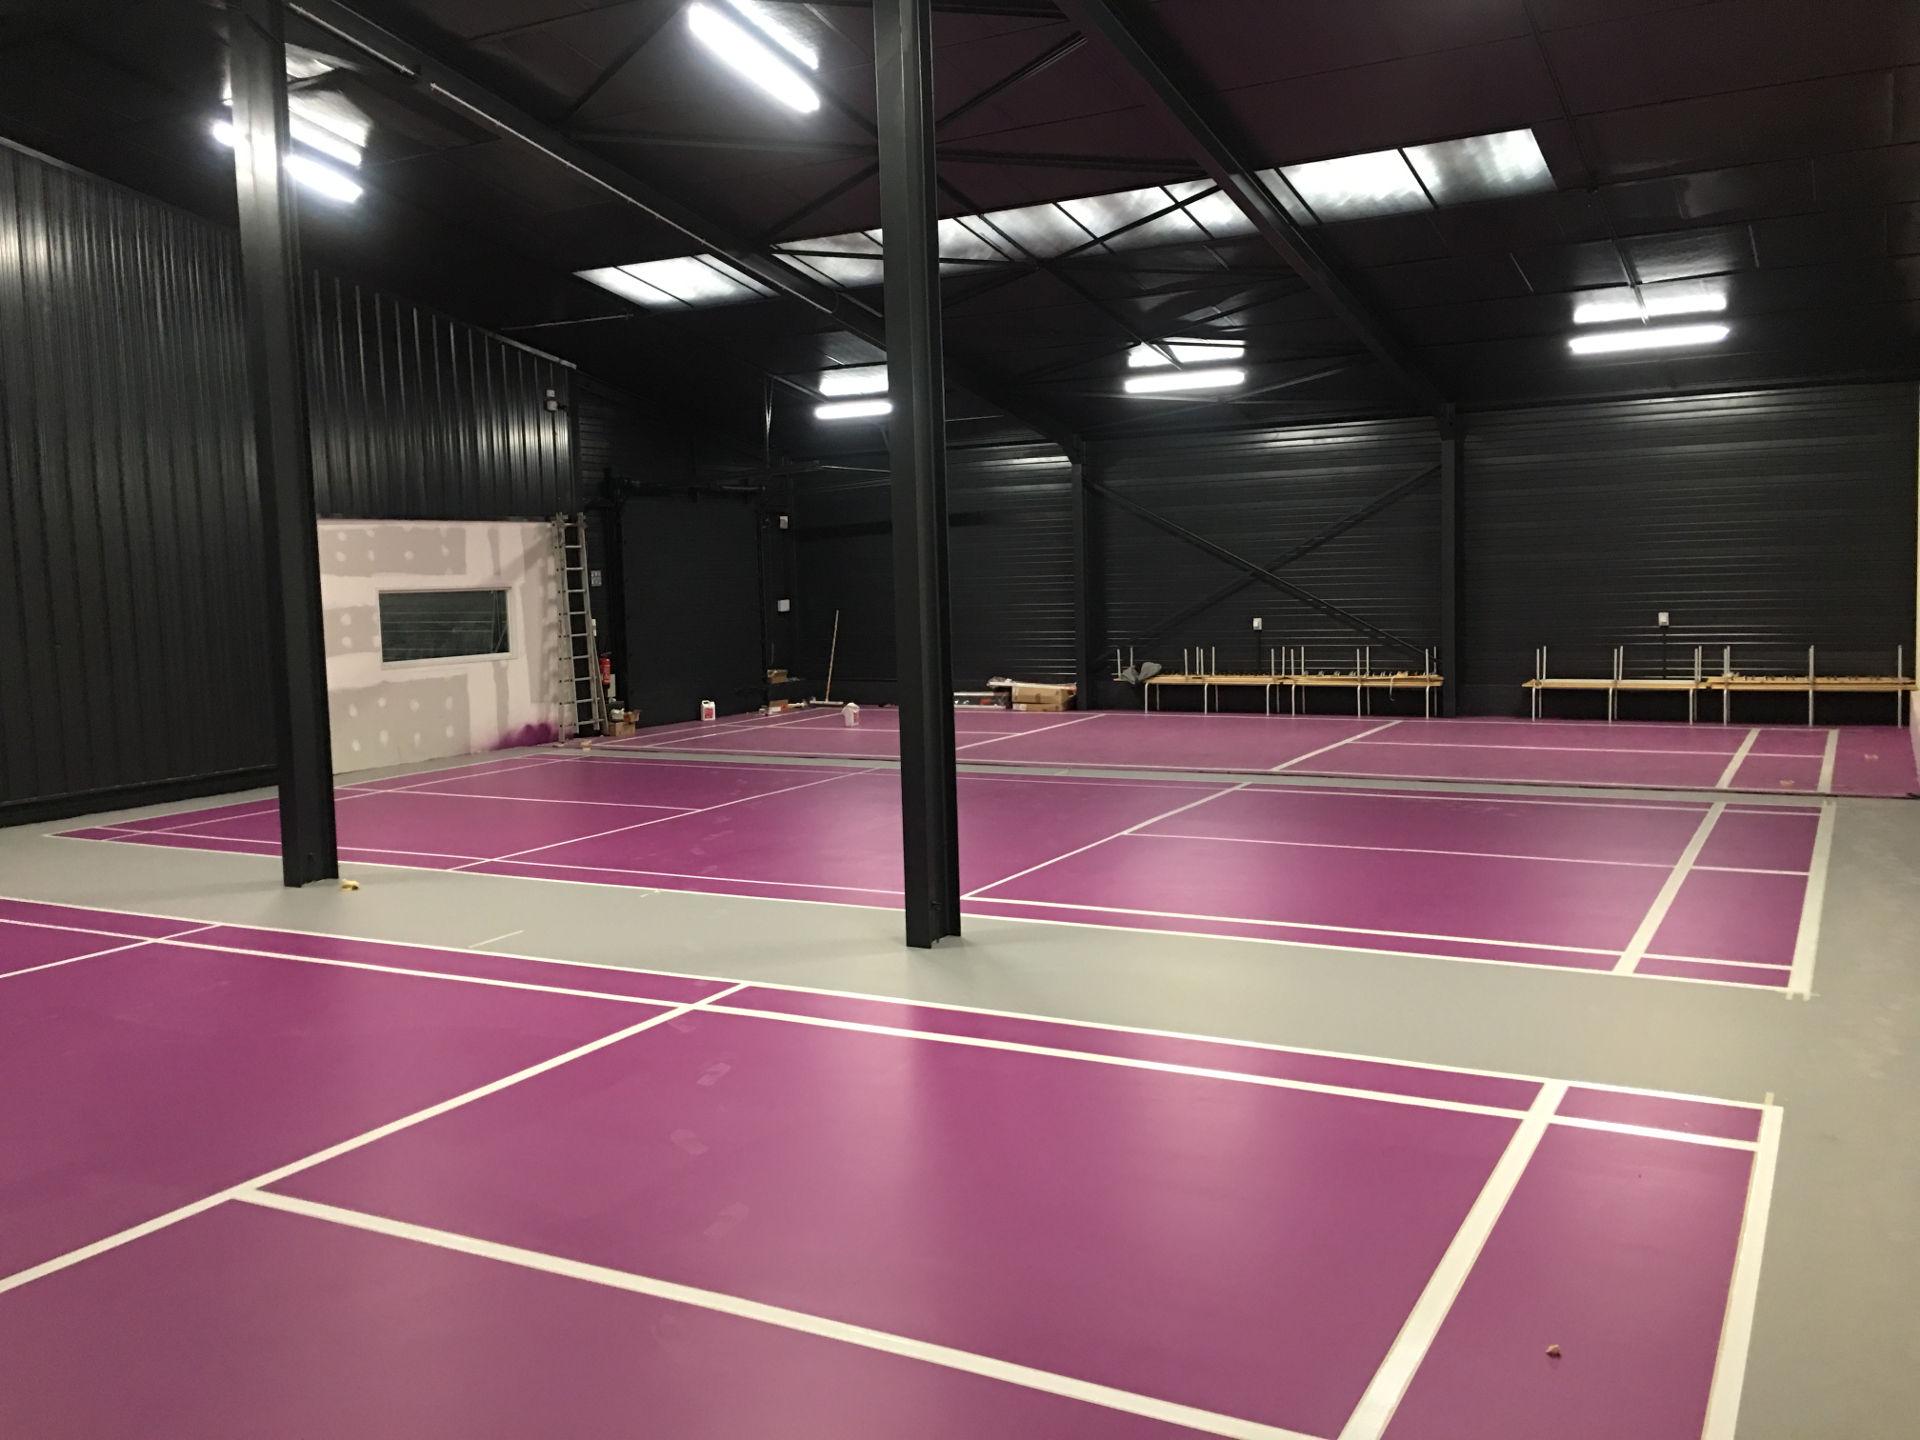 terrain badminton bicolore saint etienne